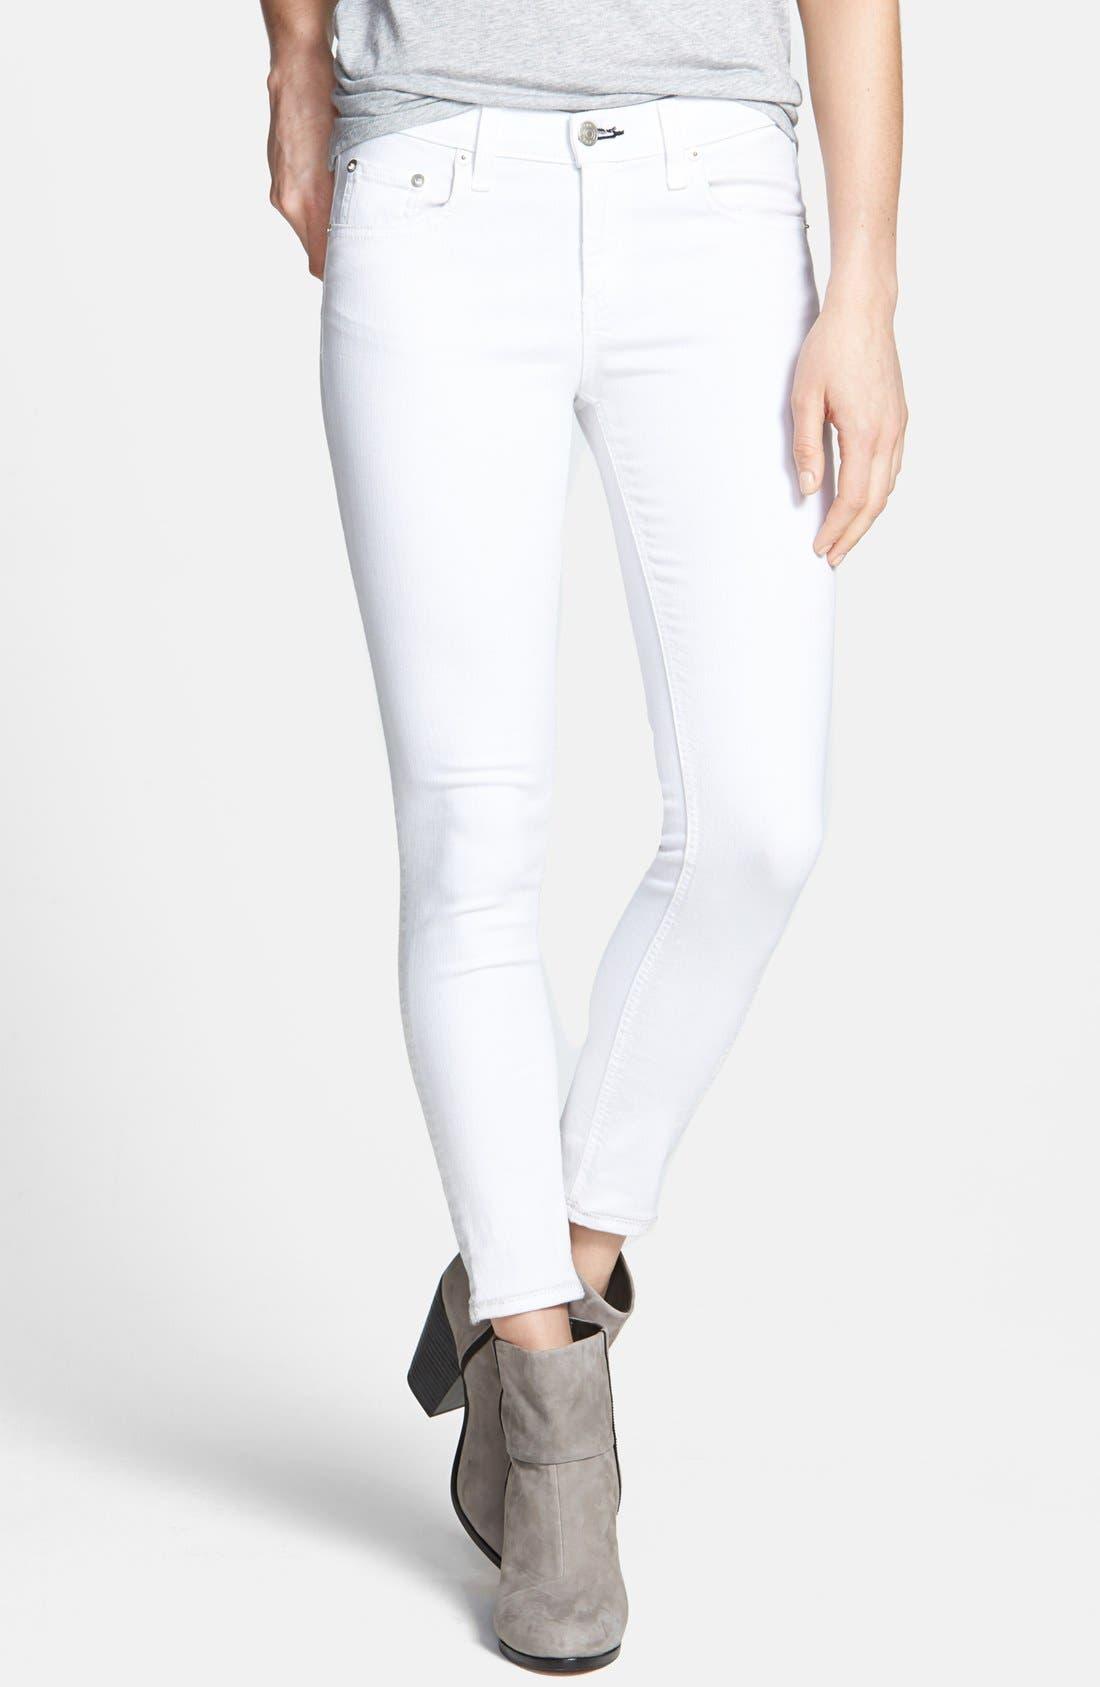 Main Image - rag & bone/JEAN 'The Skinny' Crop Jeans (Bright White)